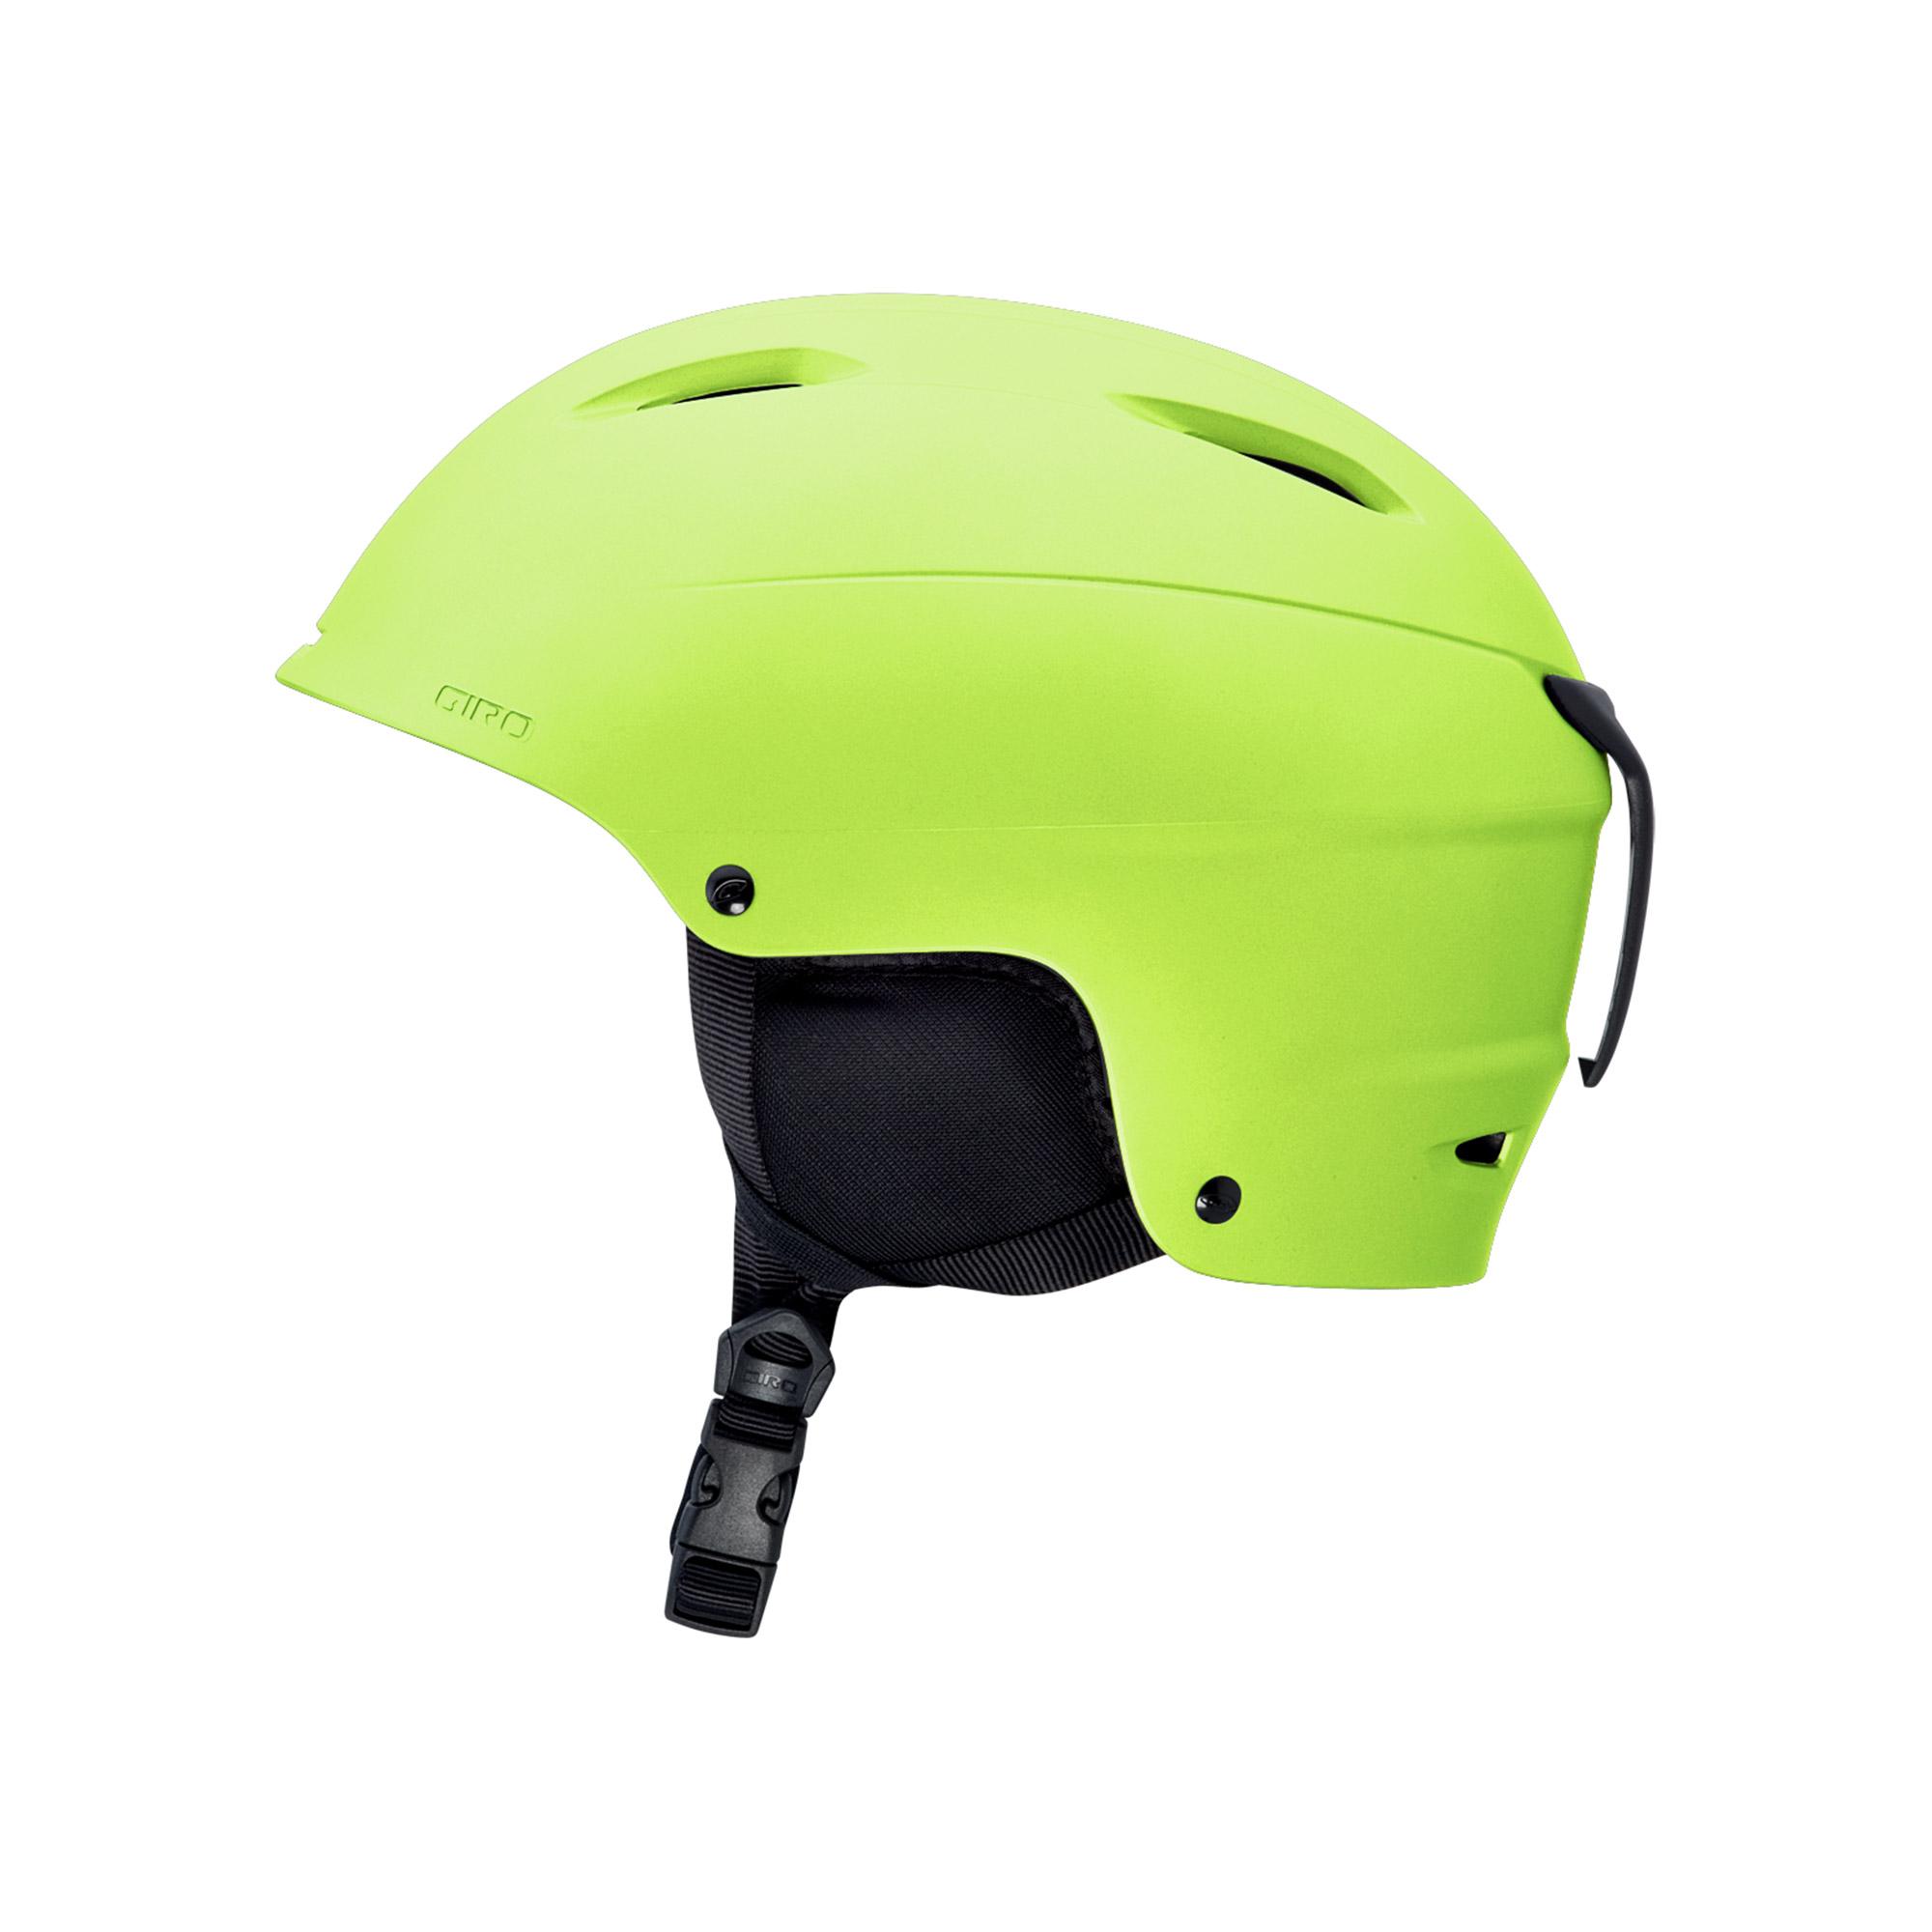 giro helmets reviews - HD